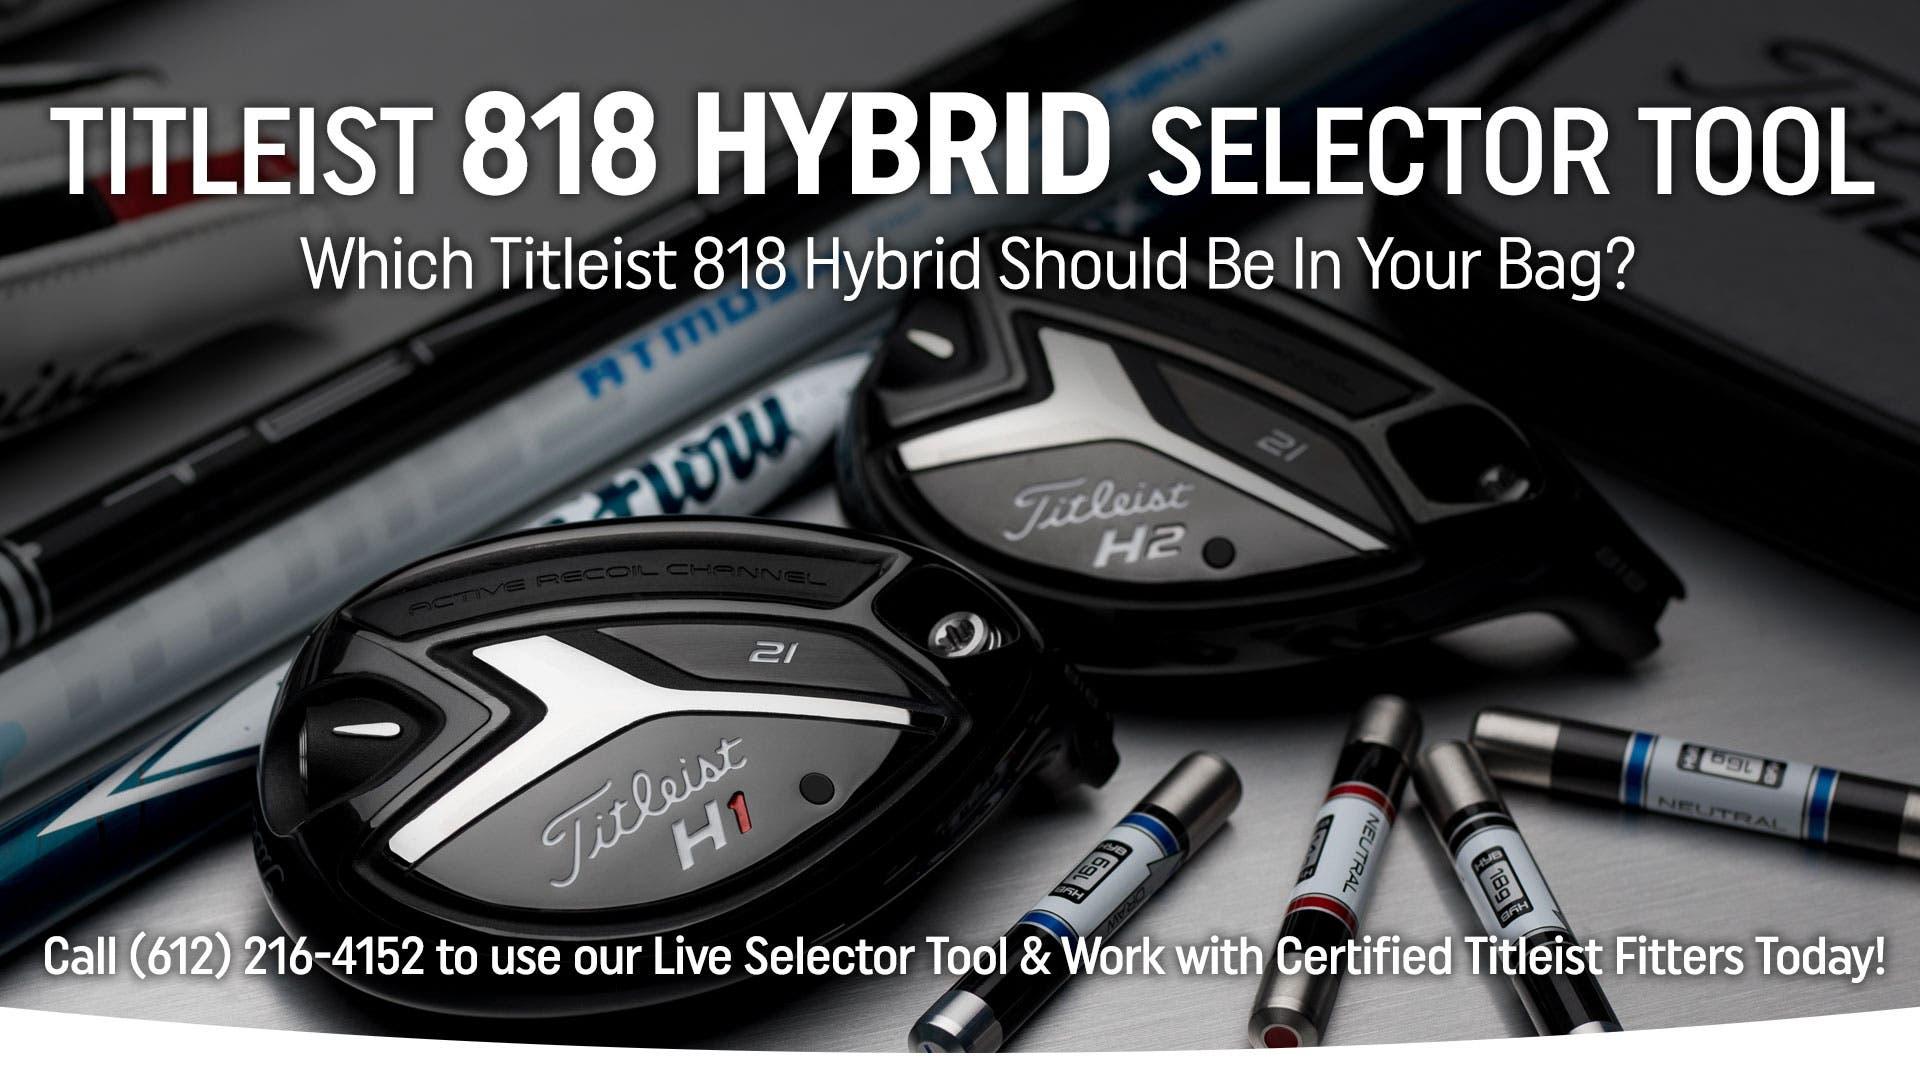 Titleist 818 Hybrids